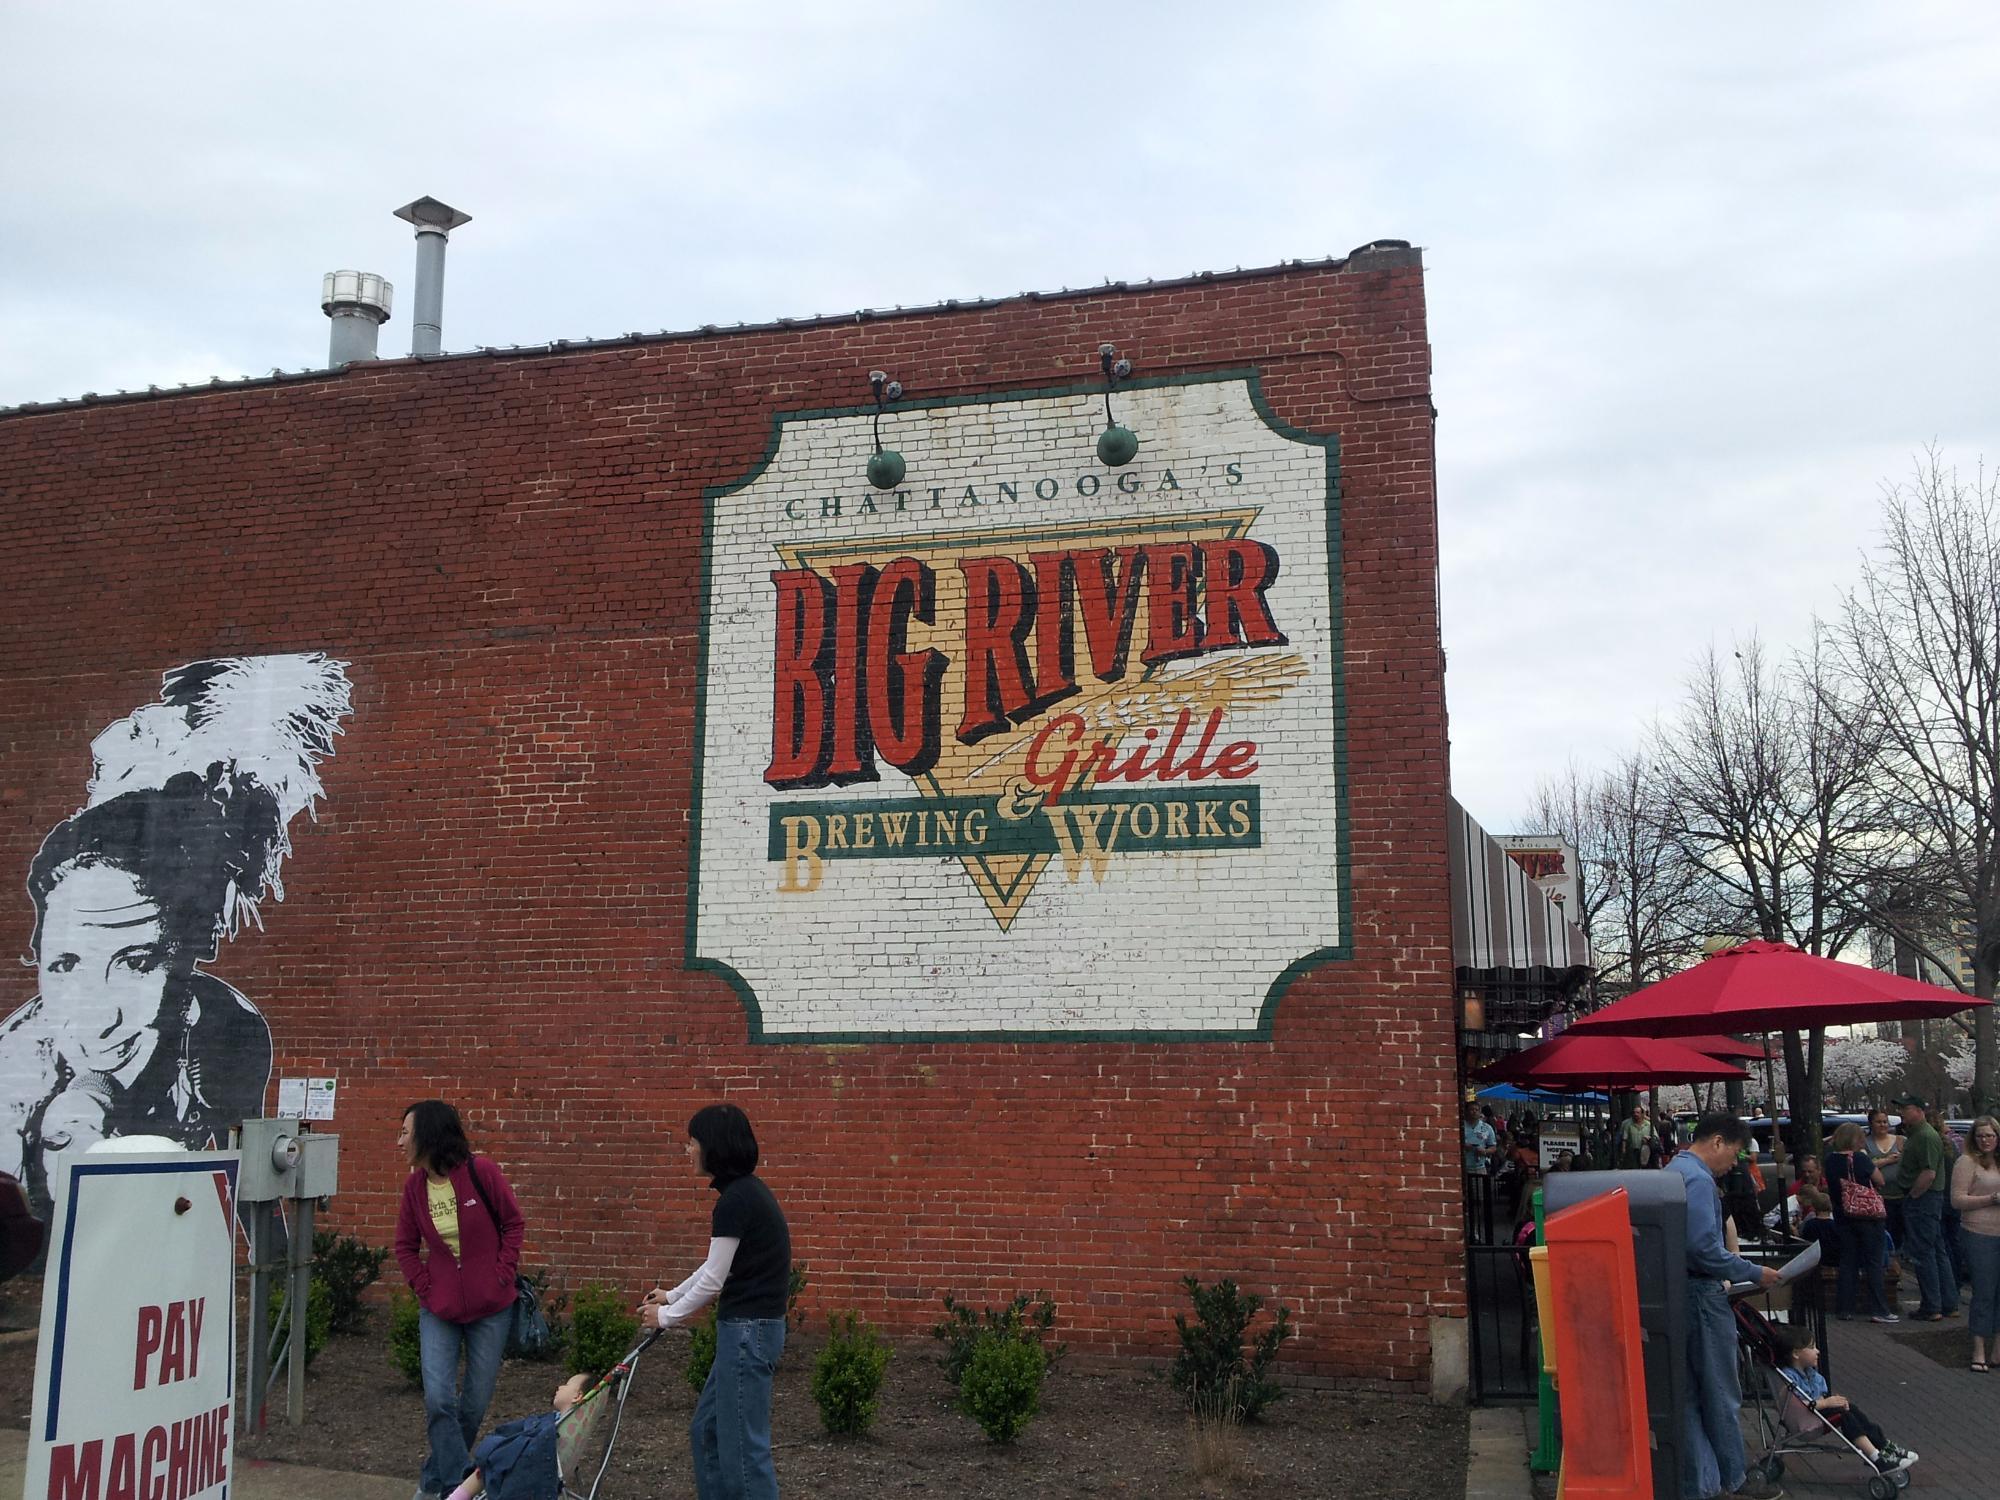 Great Restaurant, Loved it